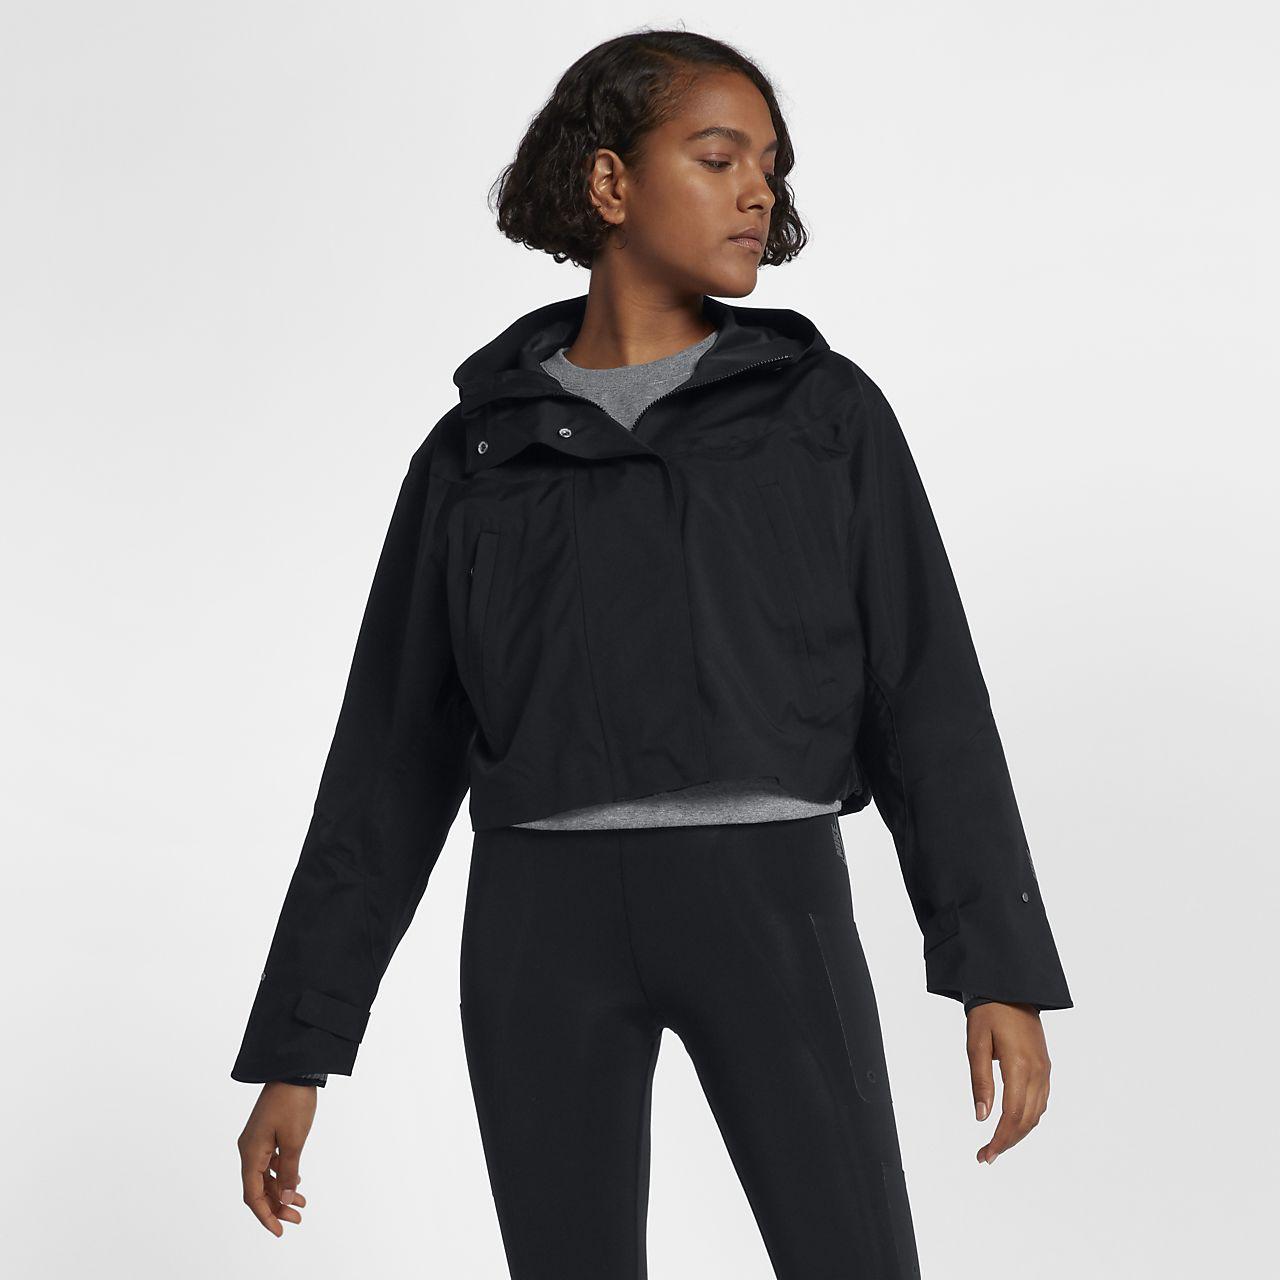 Nike City Ready Women's Cropped Jacket